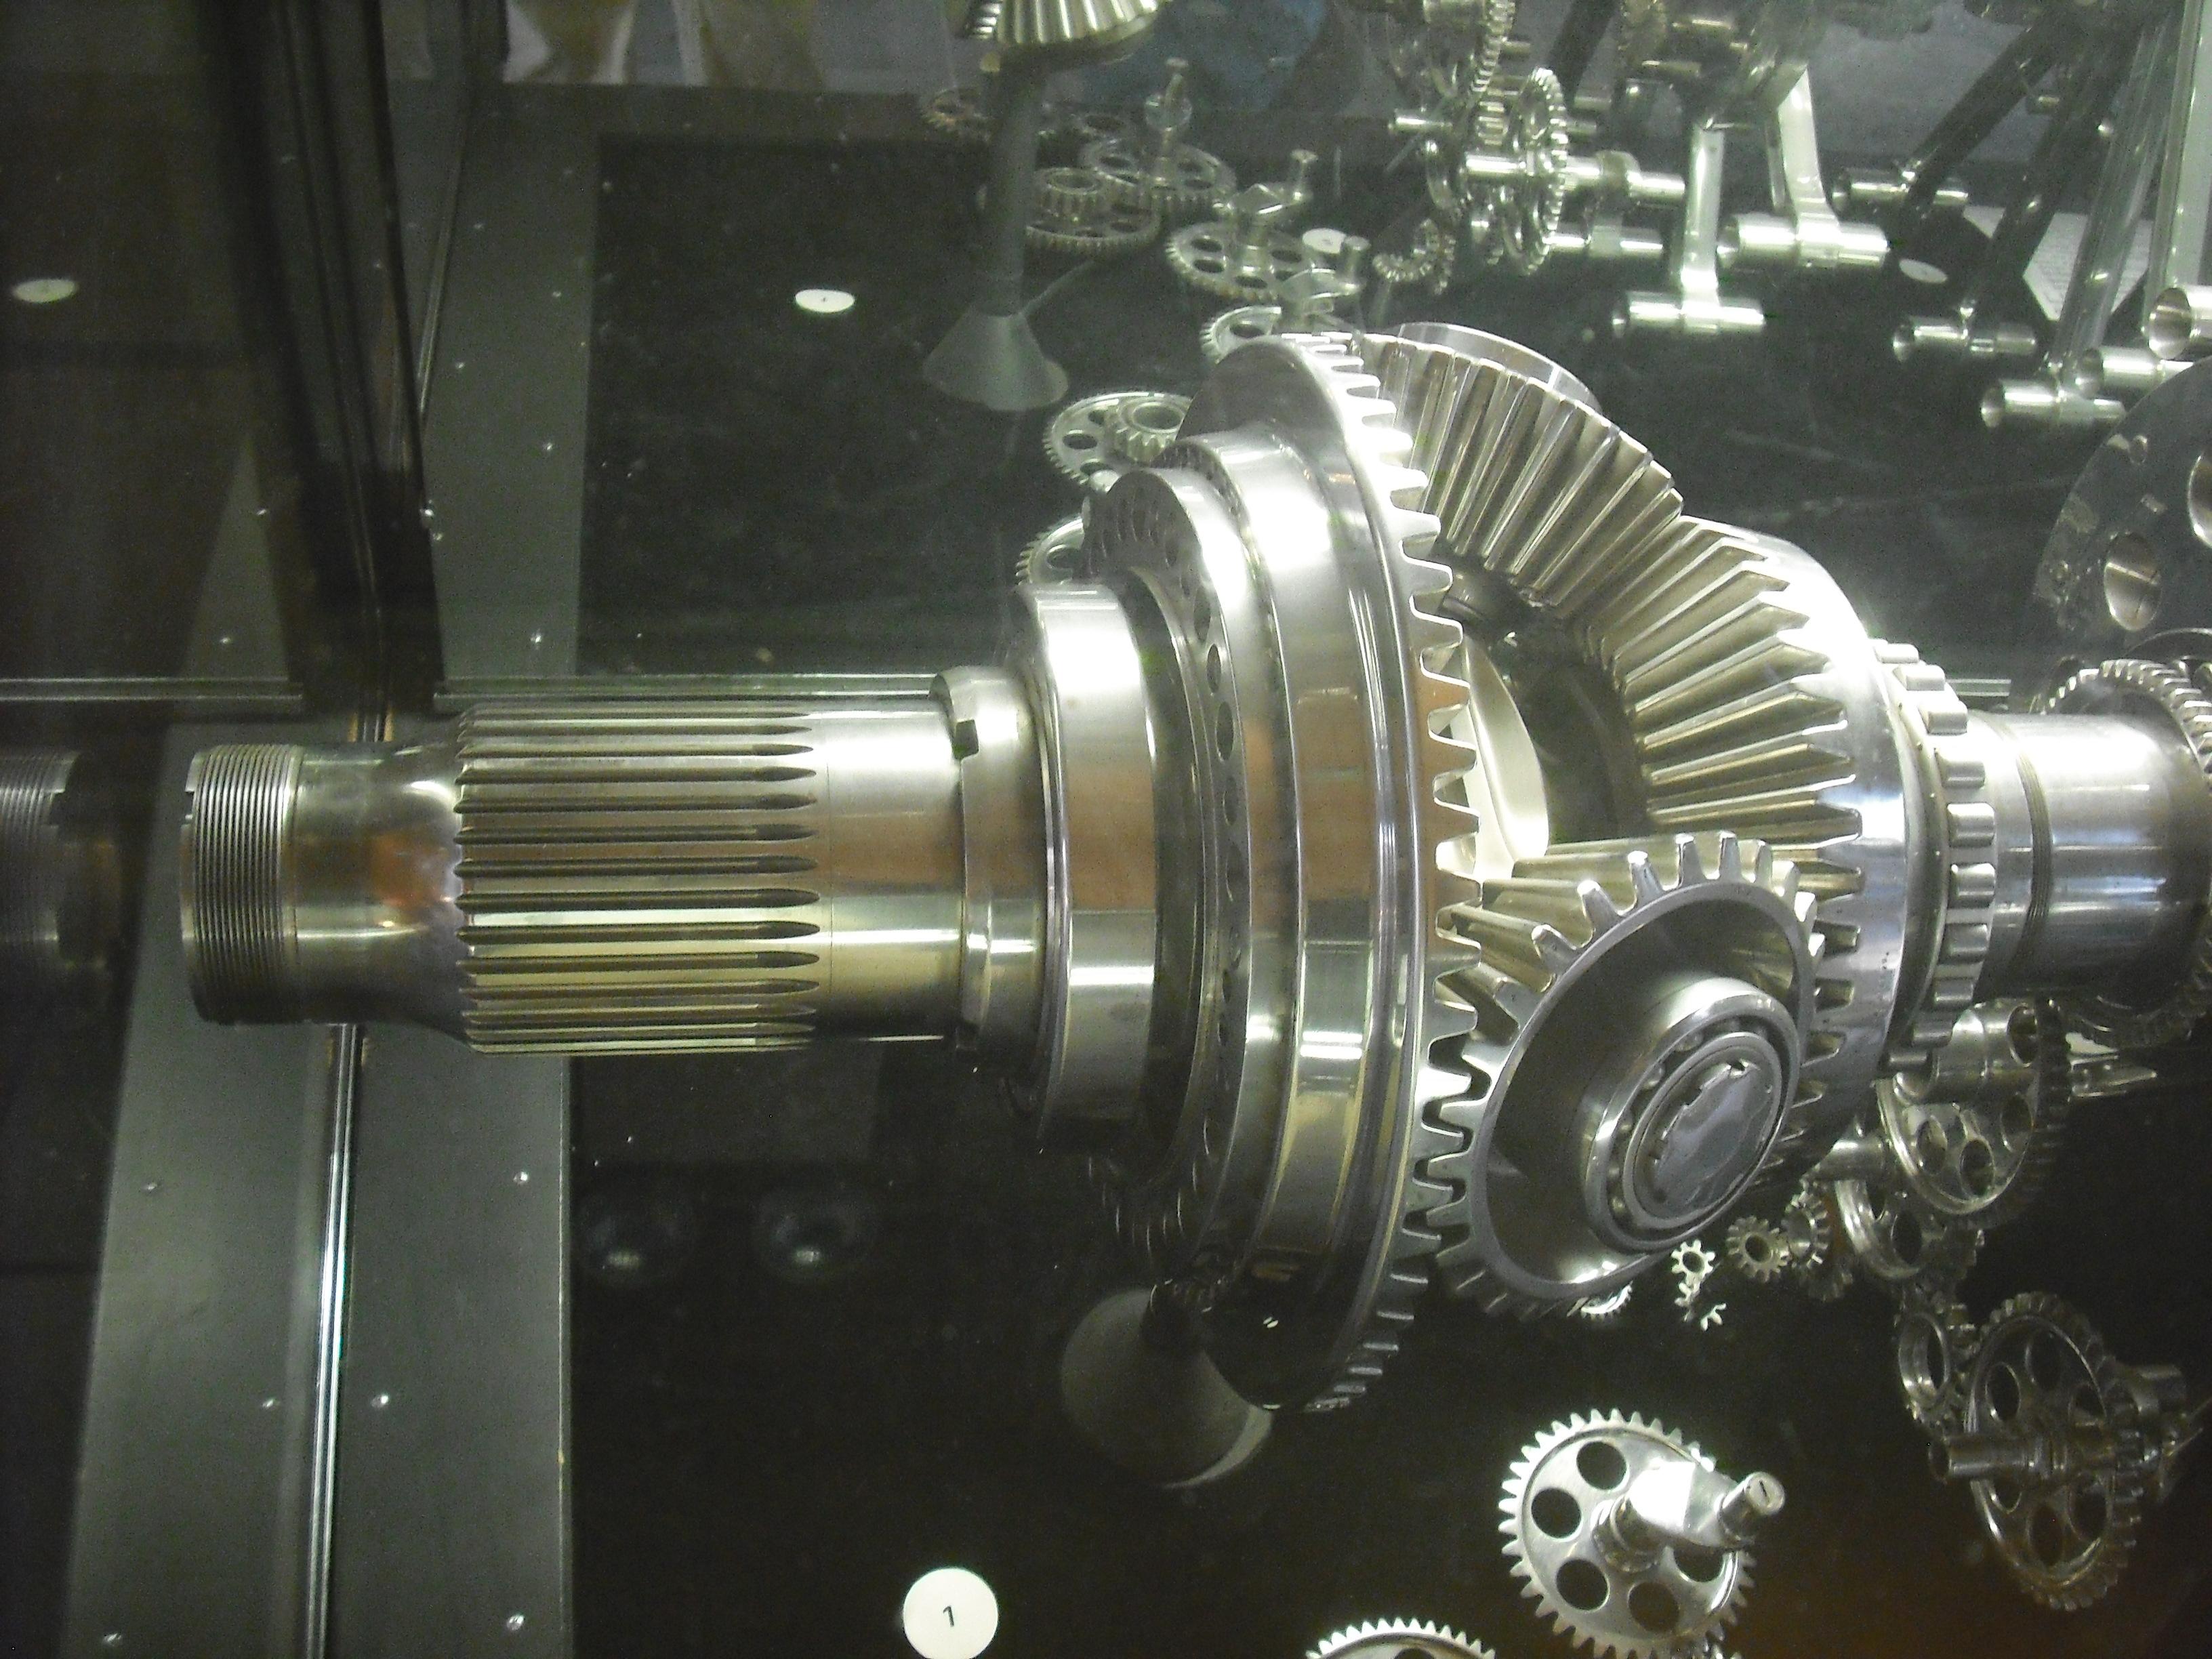 File:Bristol Centaurus, propeller reduction gears.jpg ...